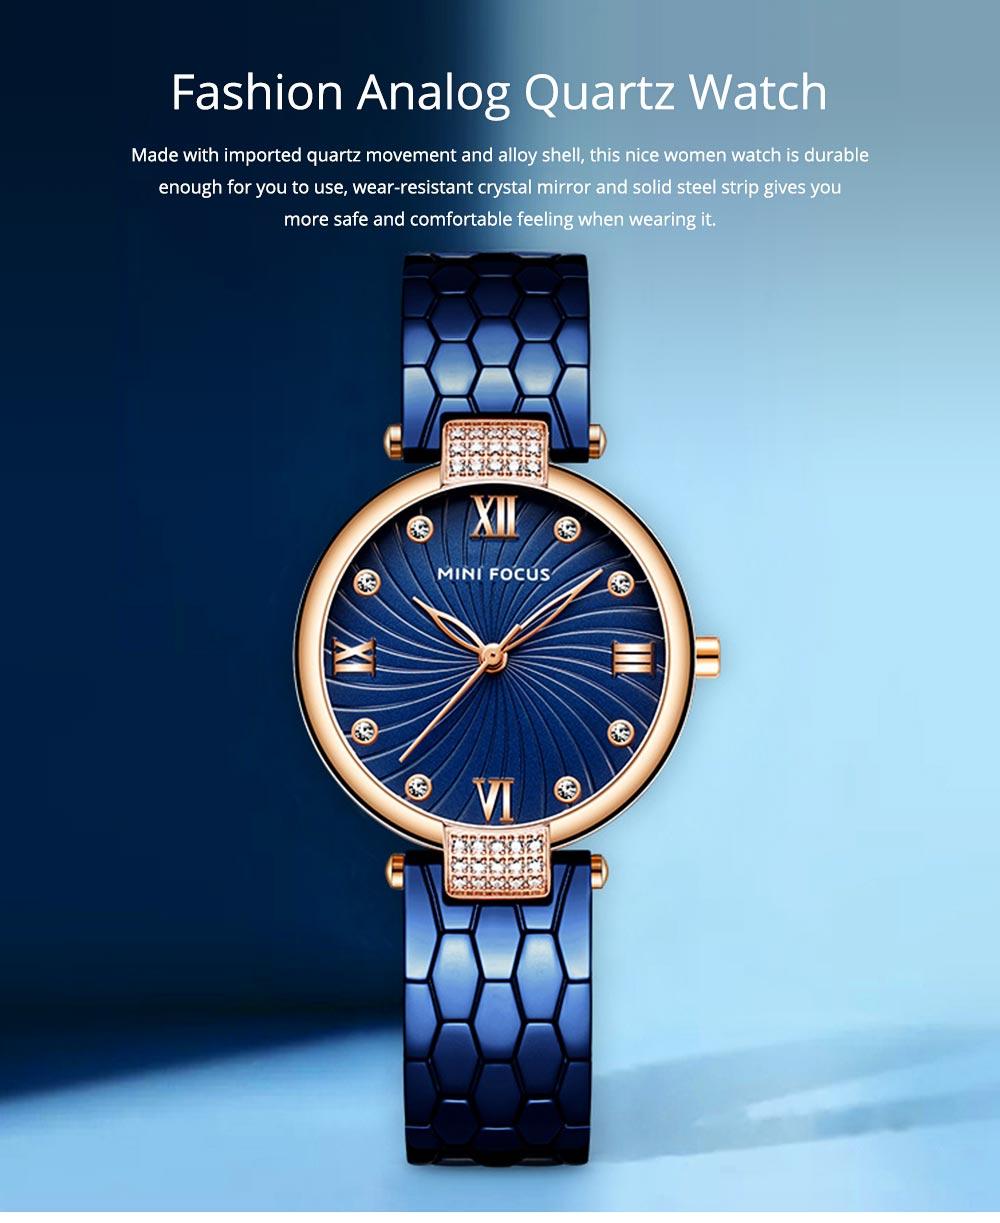 Elegant Women's Watch Stainless Steel Fashion Analog Quartz Watch 2019 Waterproof Wristwatch 0